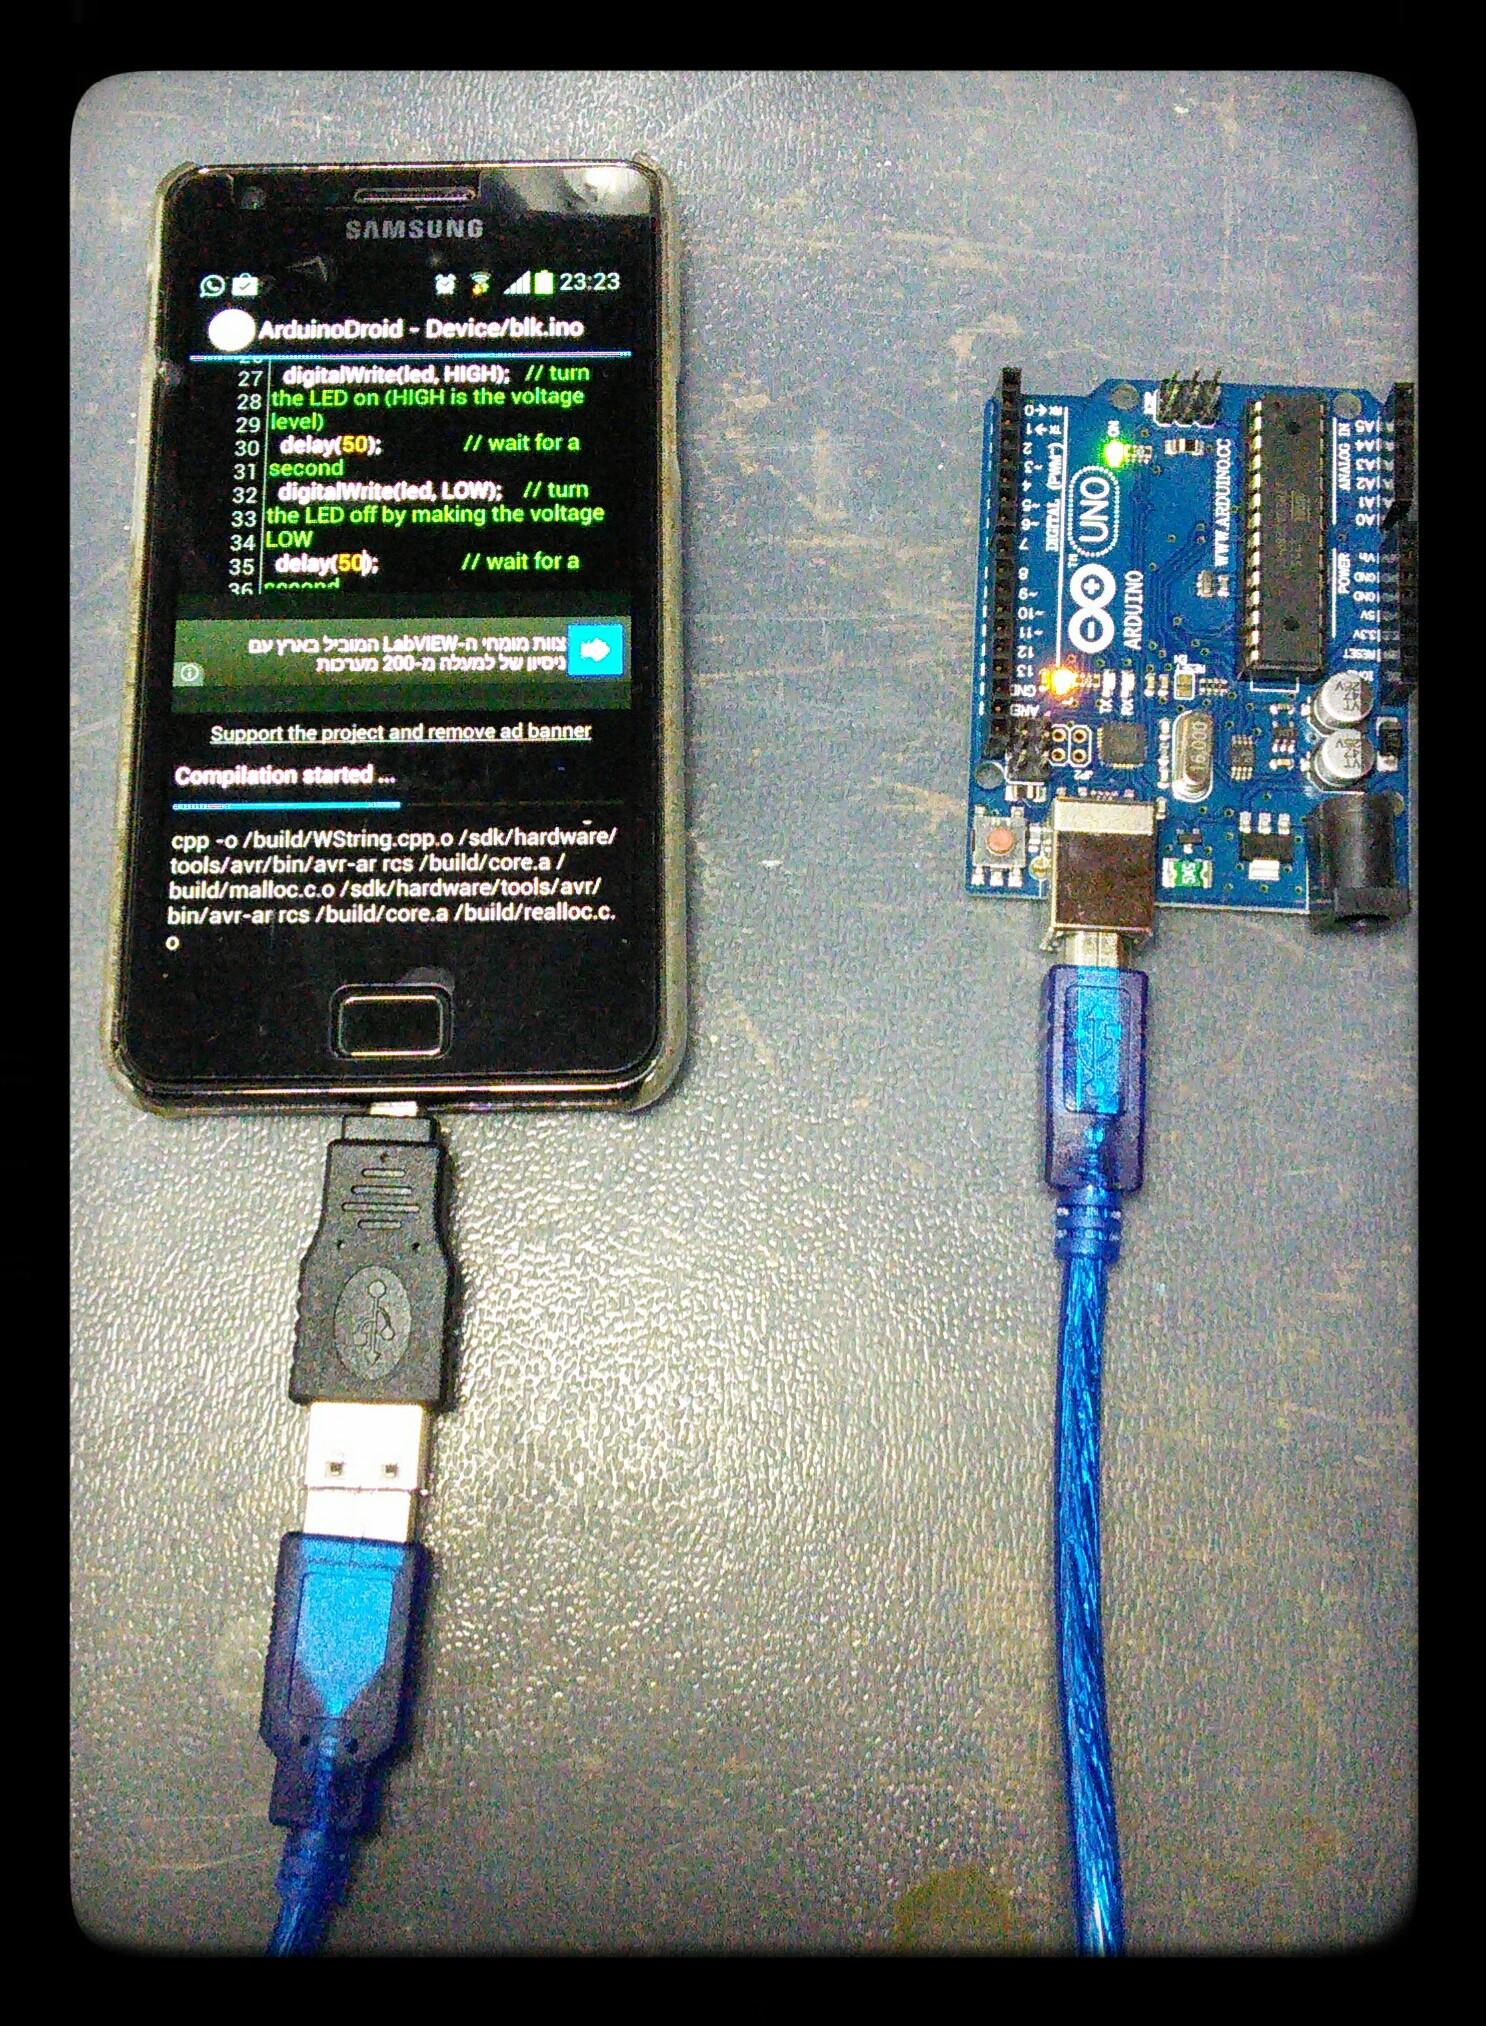 Samsung Galaxy S2 and Arduino